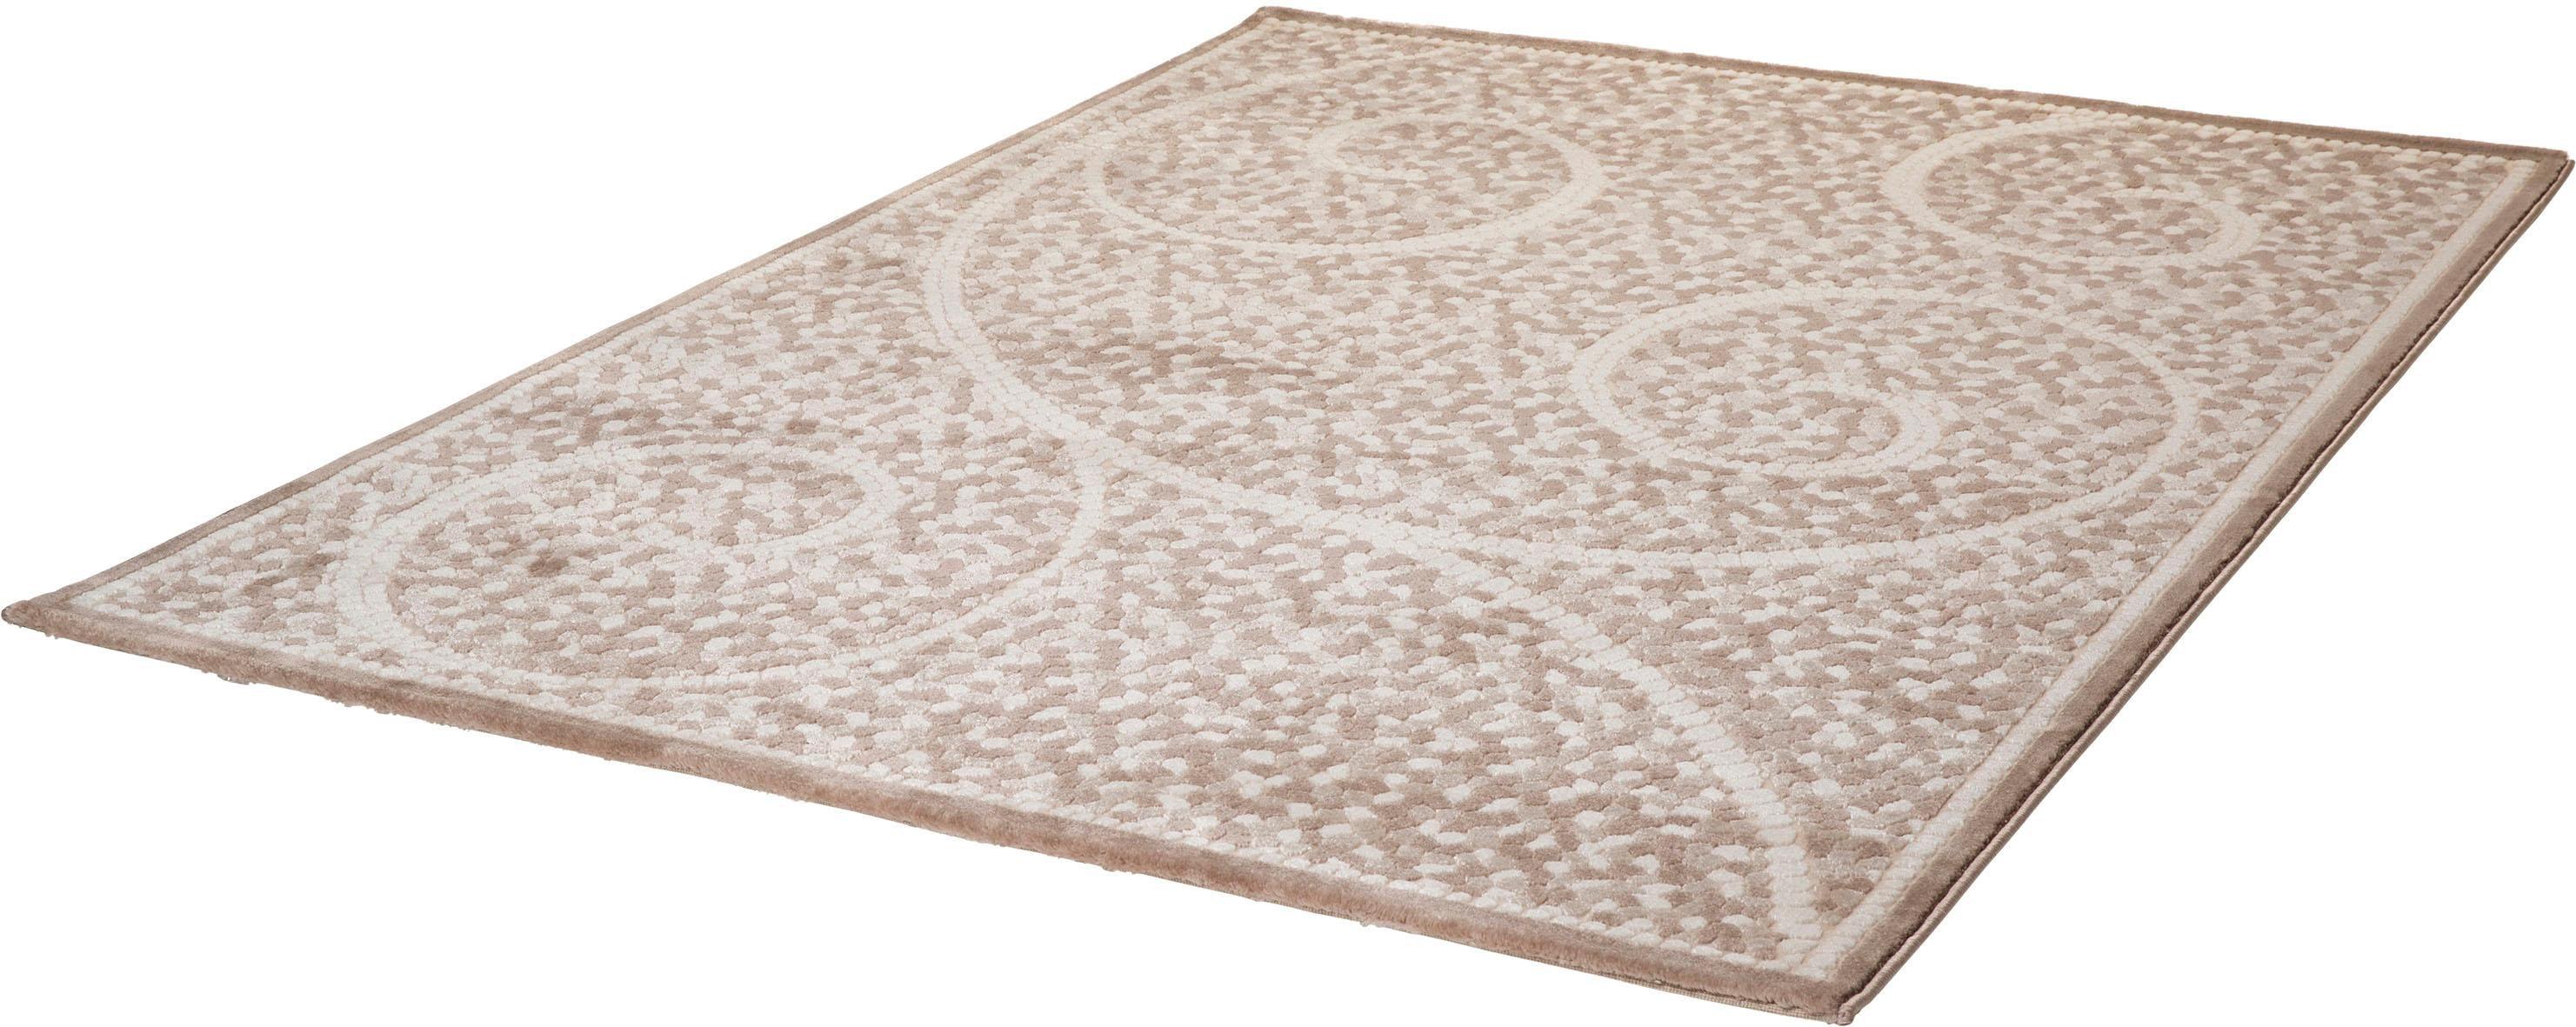 Teppich My Bolero 815 Obsession rechteckig Höhe 16 mm maschinell gewebt